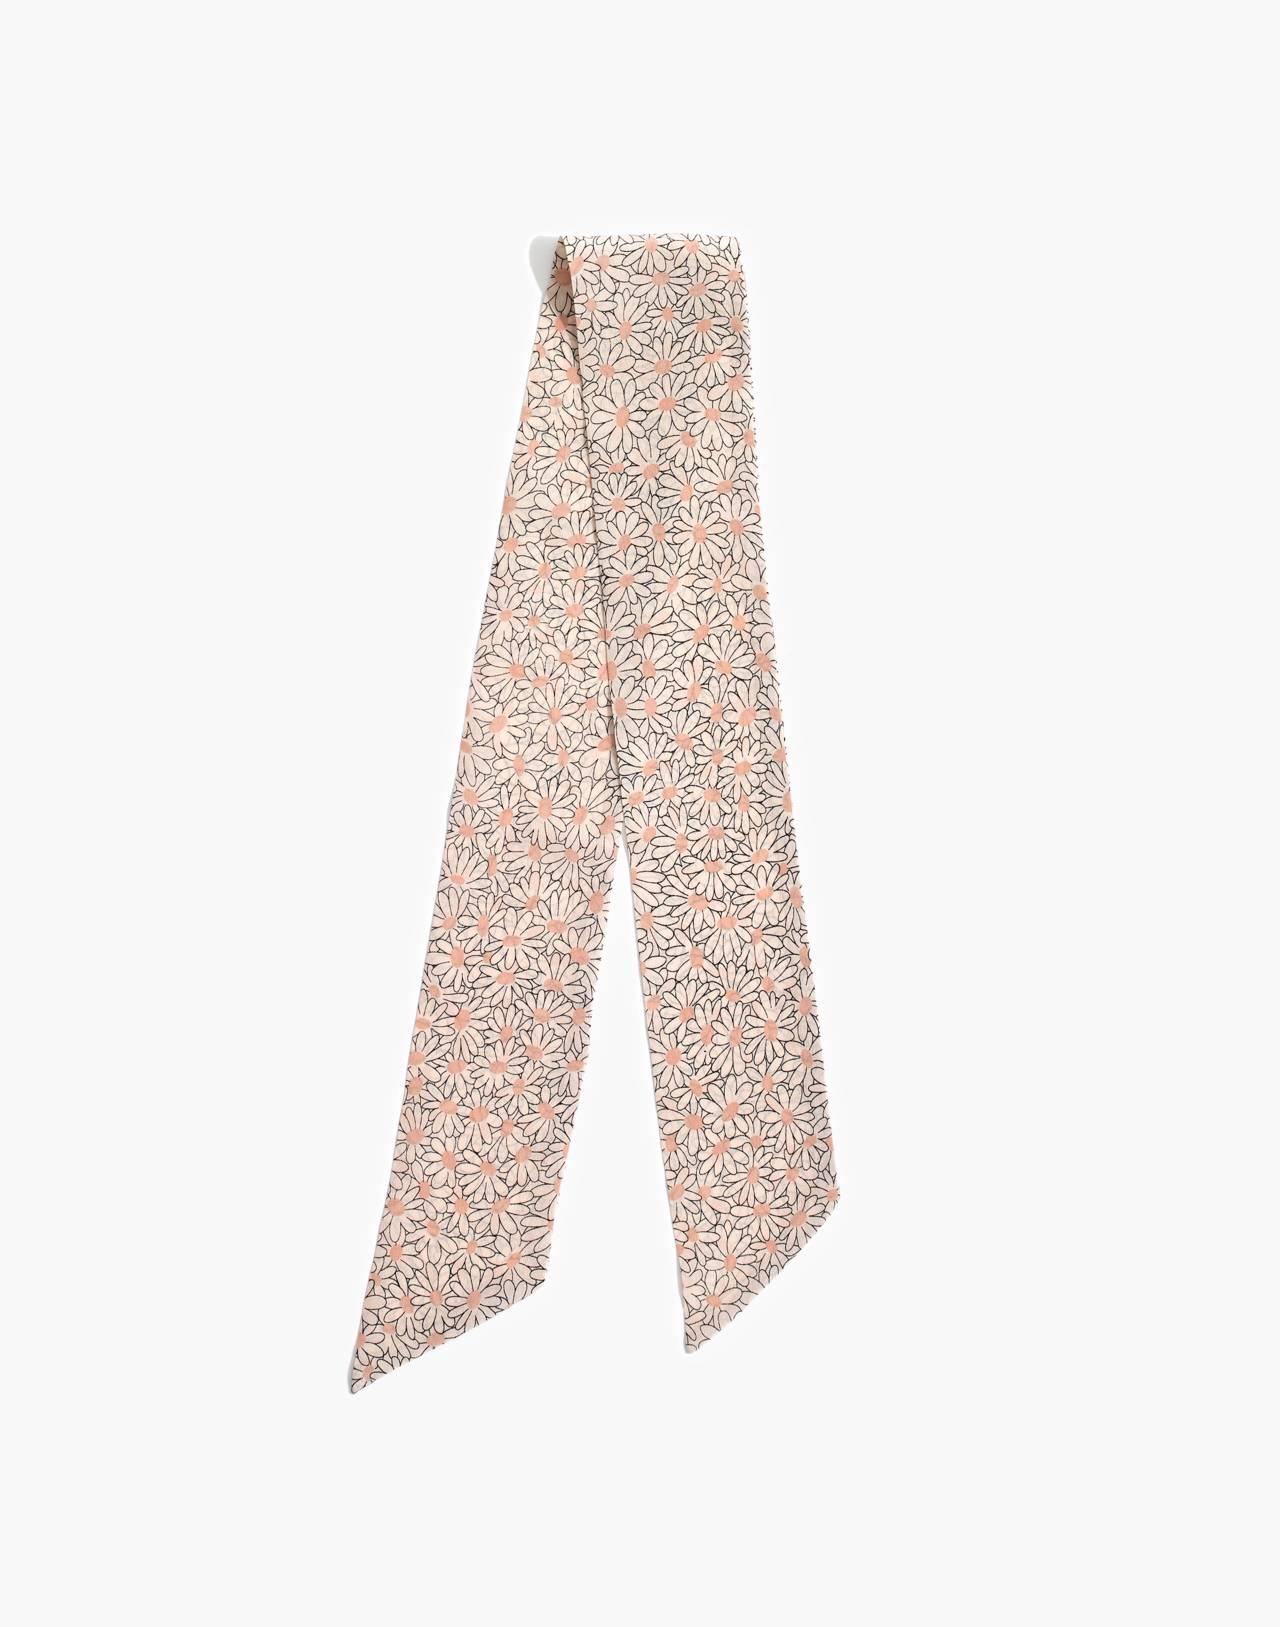 Silk Skinny Bandana in antique lace multi image 2